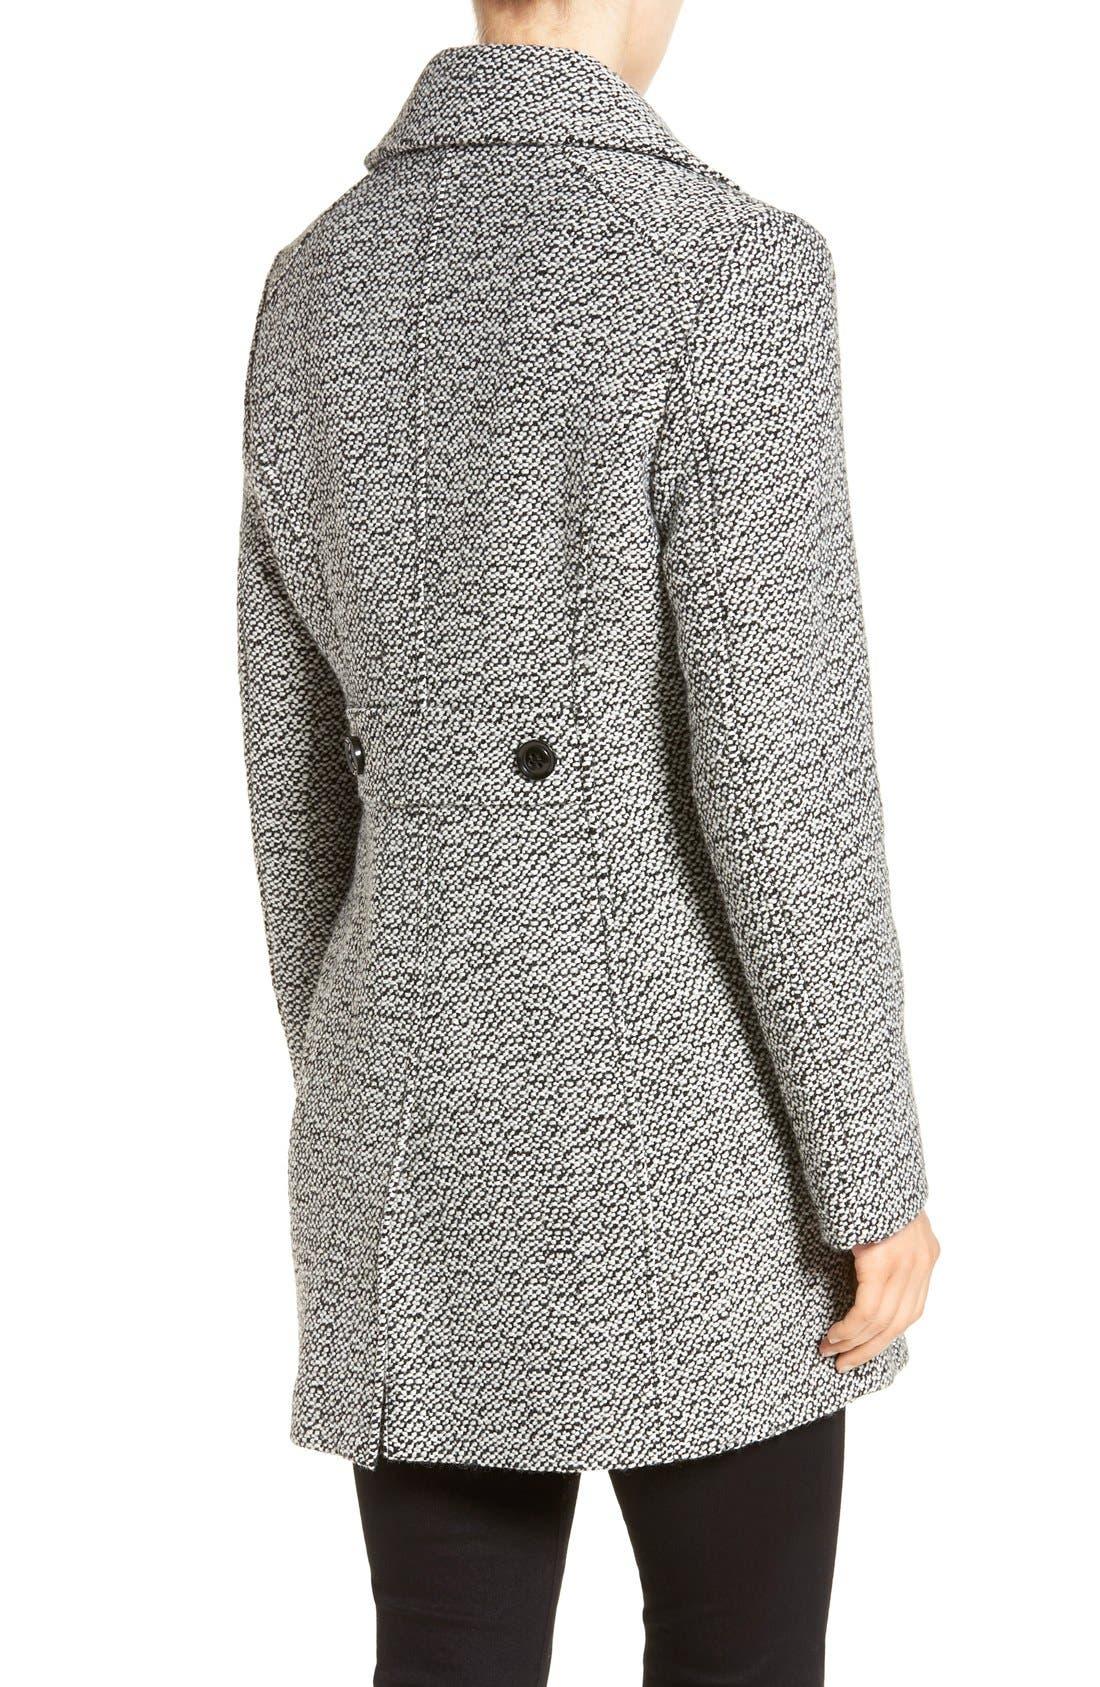 Notch Collar Tweed Coat,                             Alternate thumbnail 2, color,                             White/ Black